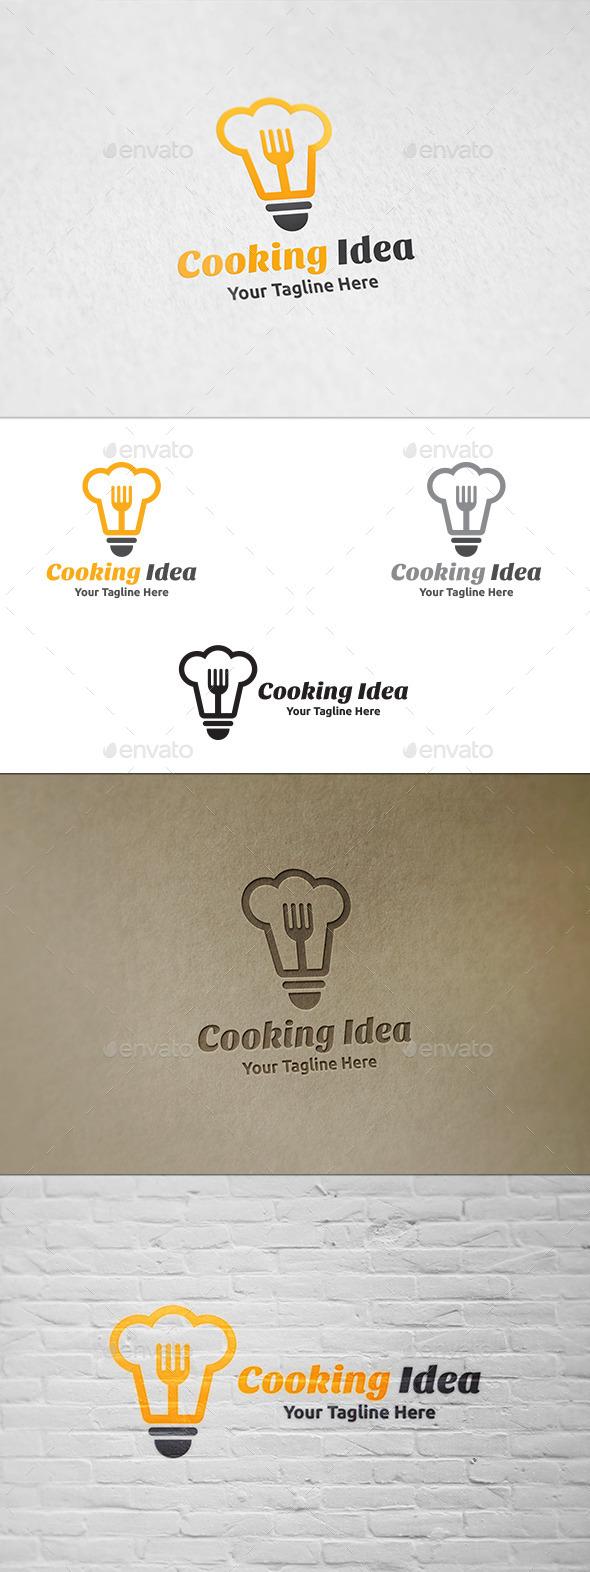 GraphicRiver Cooking Idea Logo Template 11869642